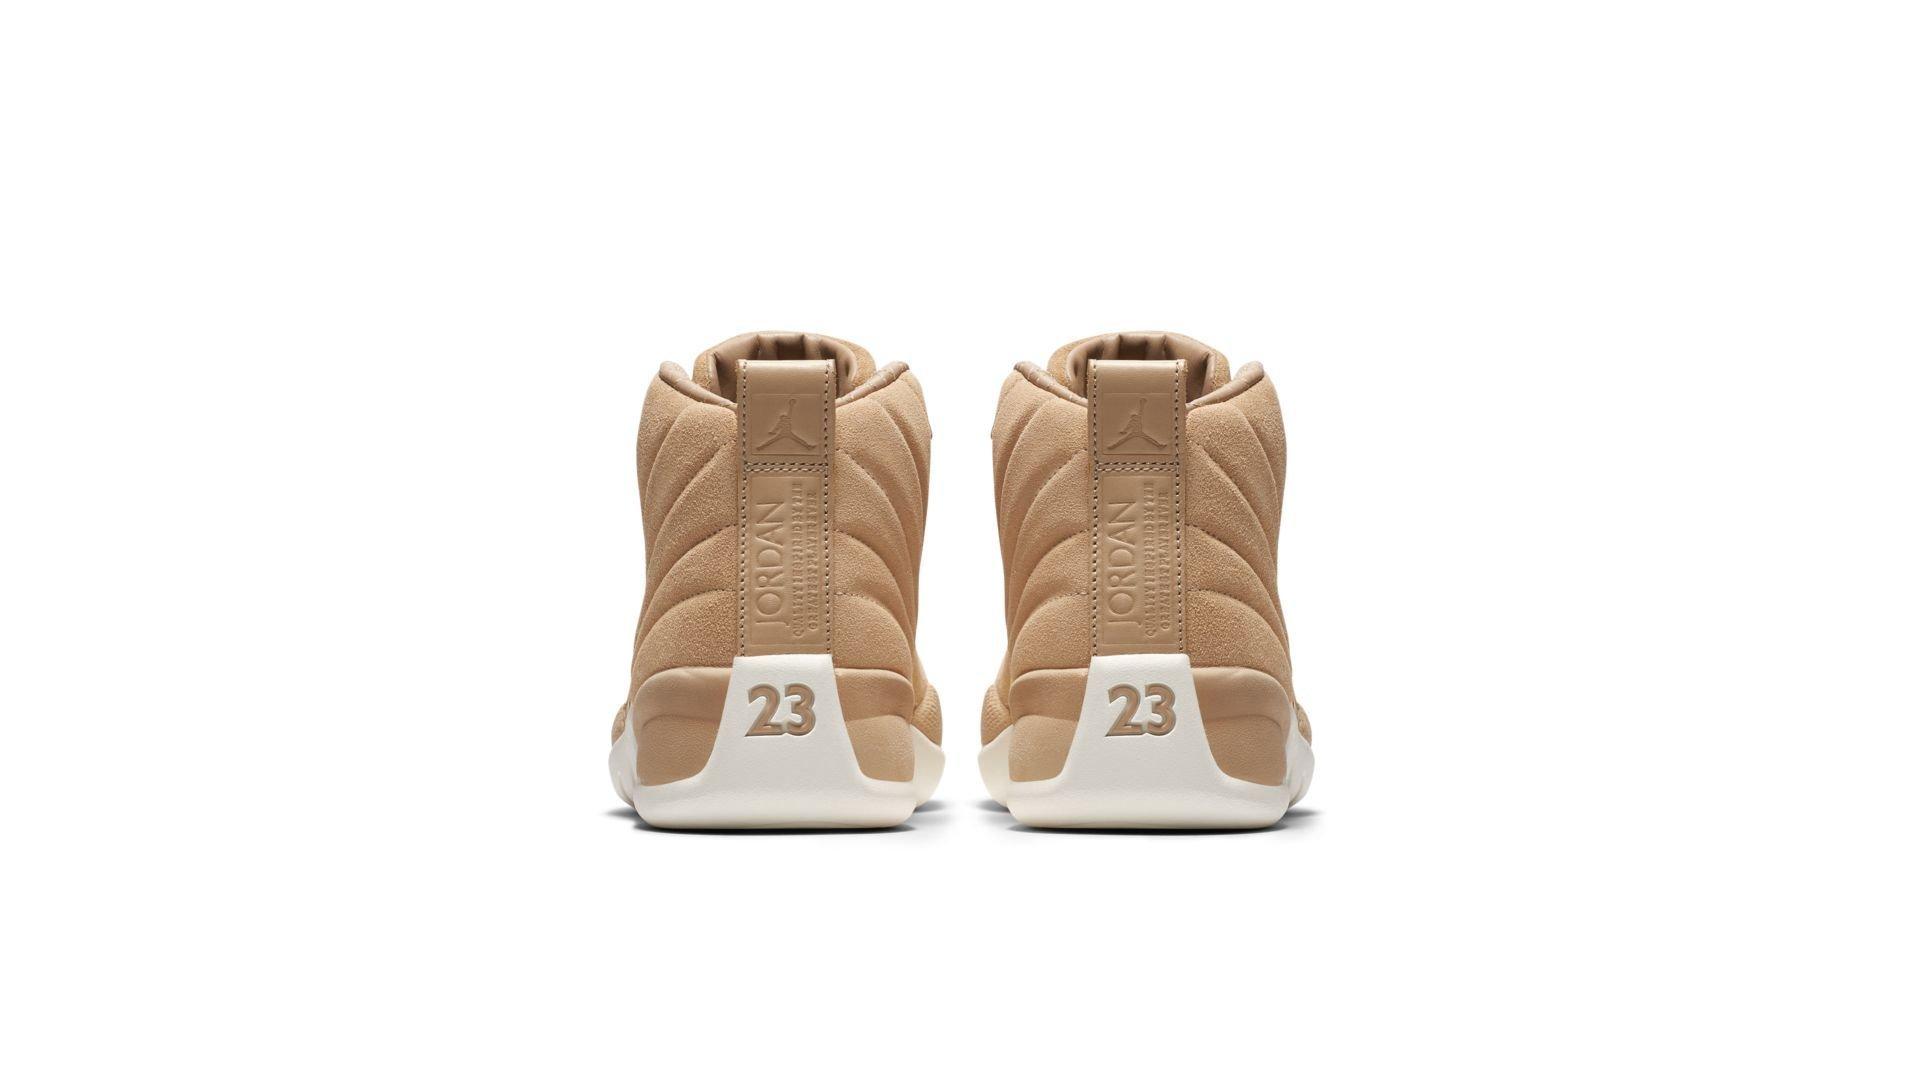 Jordan 12 Retro Vachetta Tan (W) (AO6068-203)